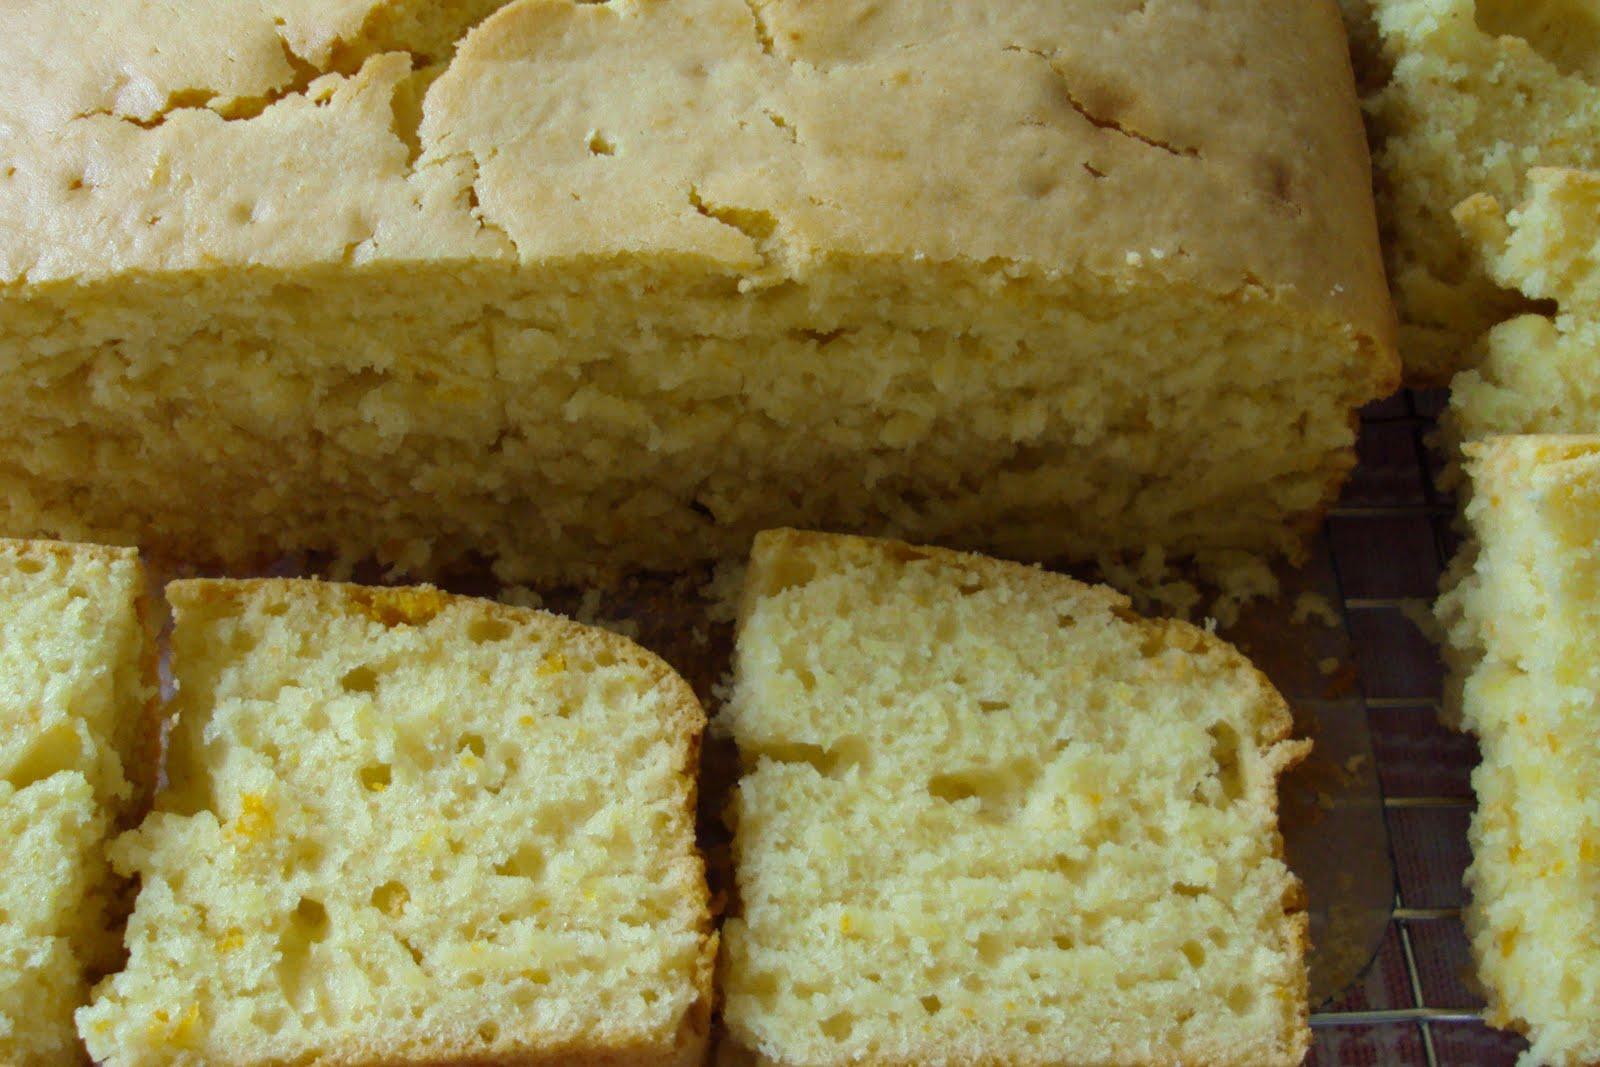 Cake Recipe With Low Fat Yogurt: YUMMY BAKES: Low Fat Orange Yogurt Cake